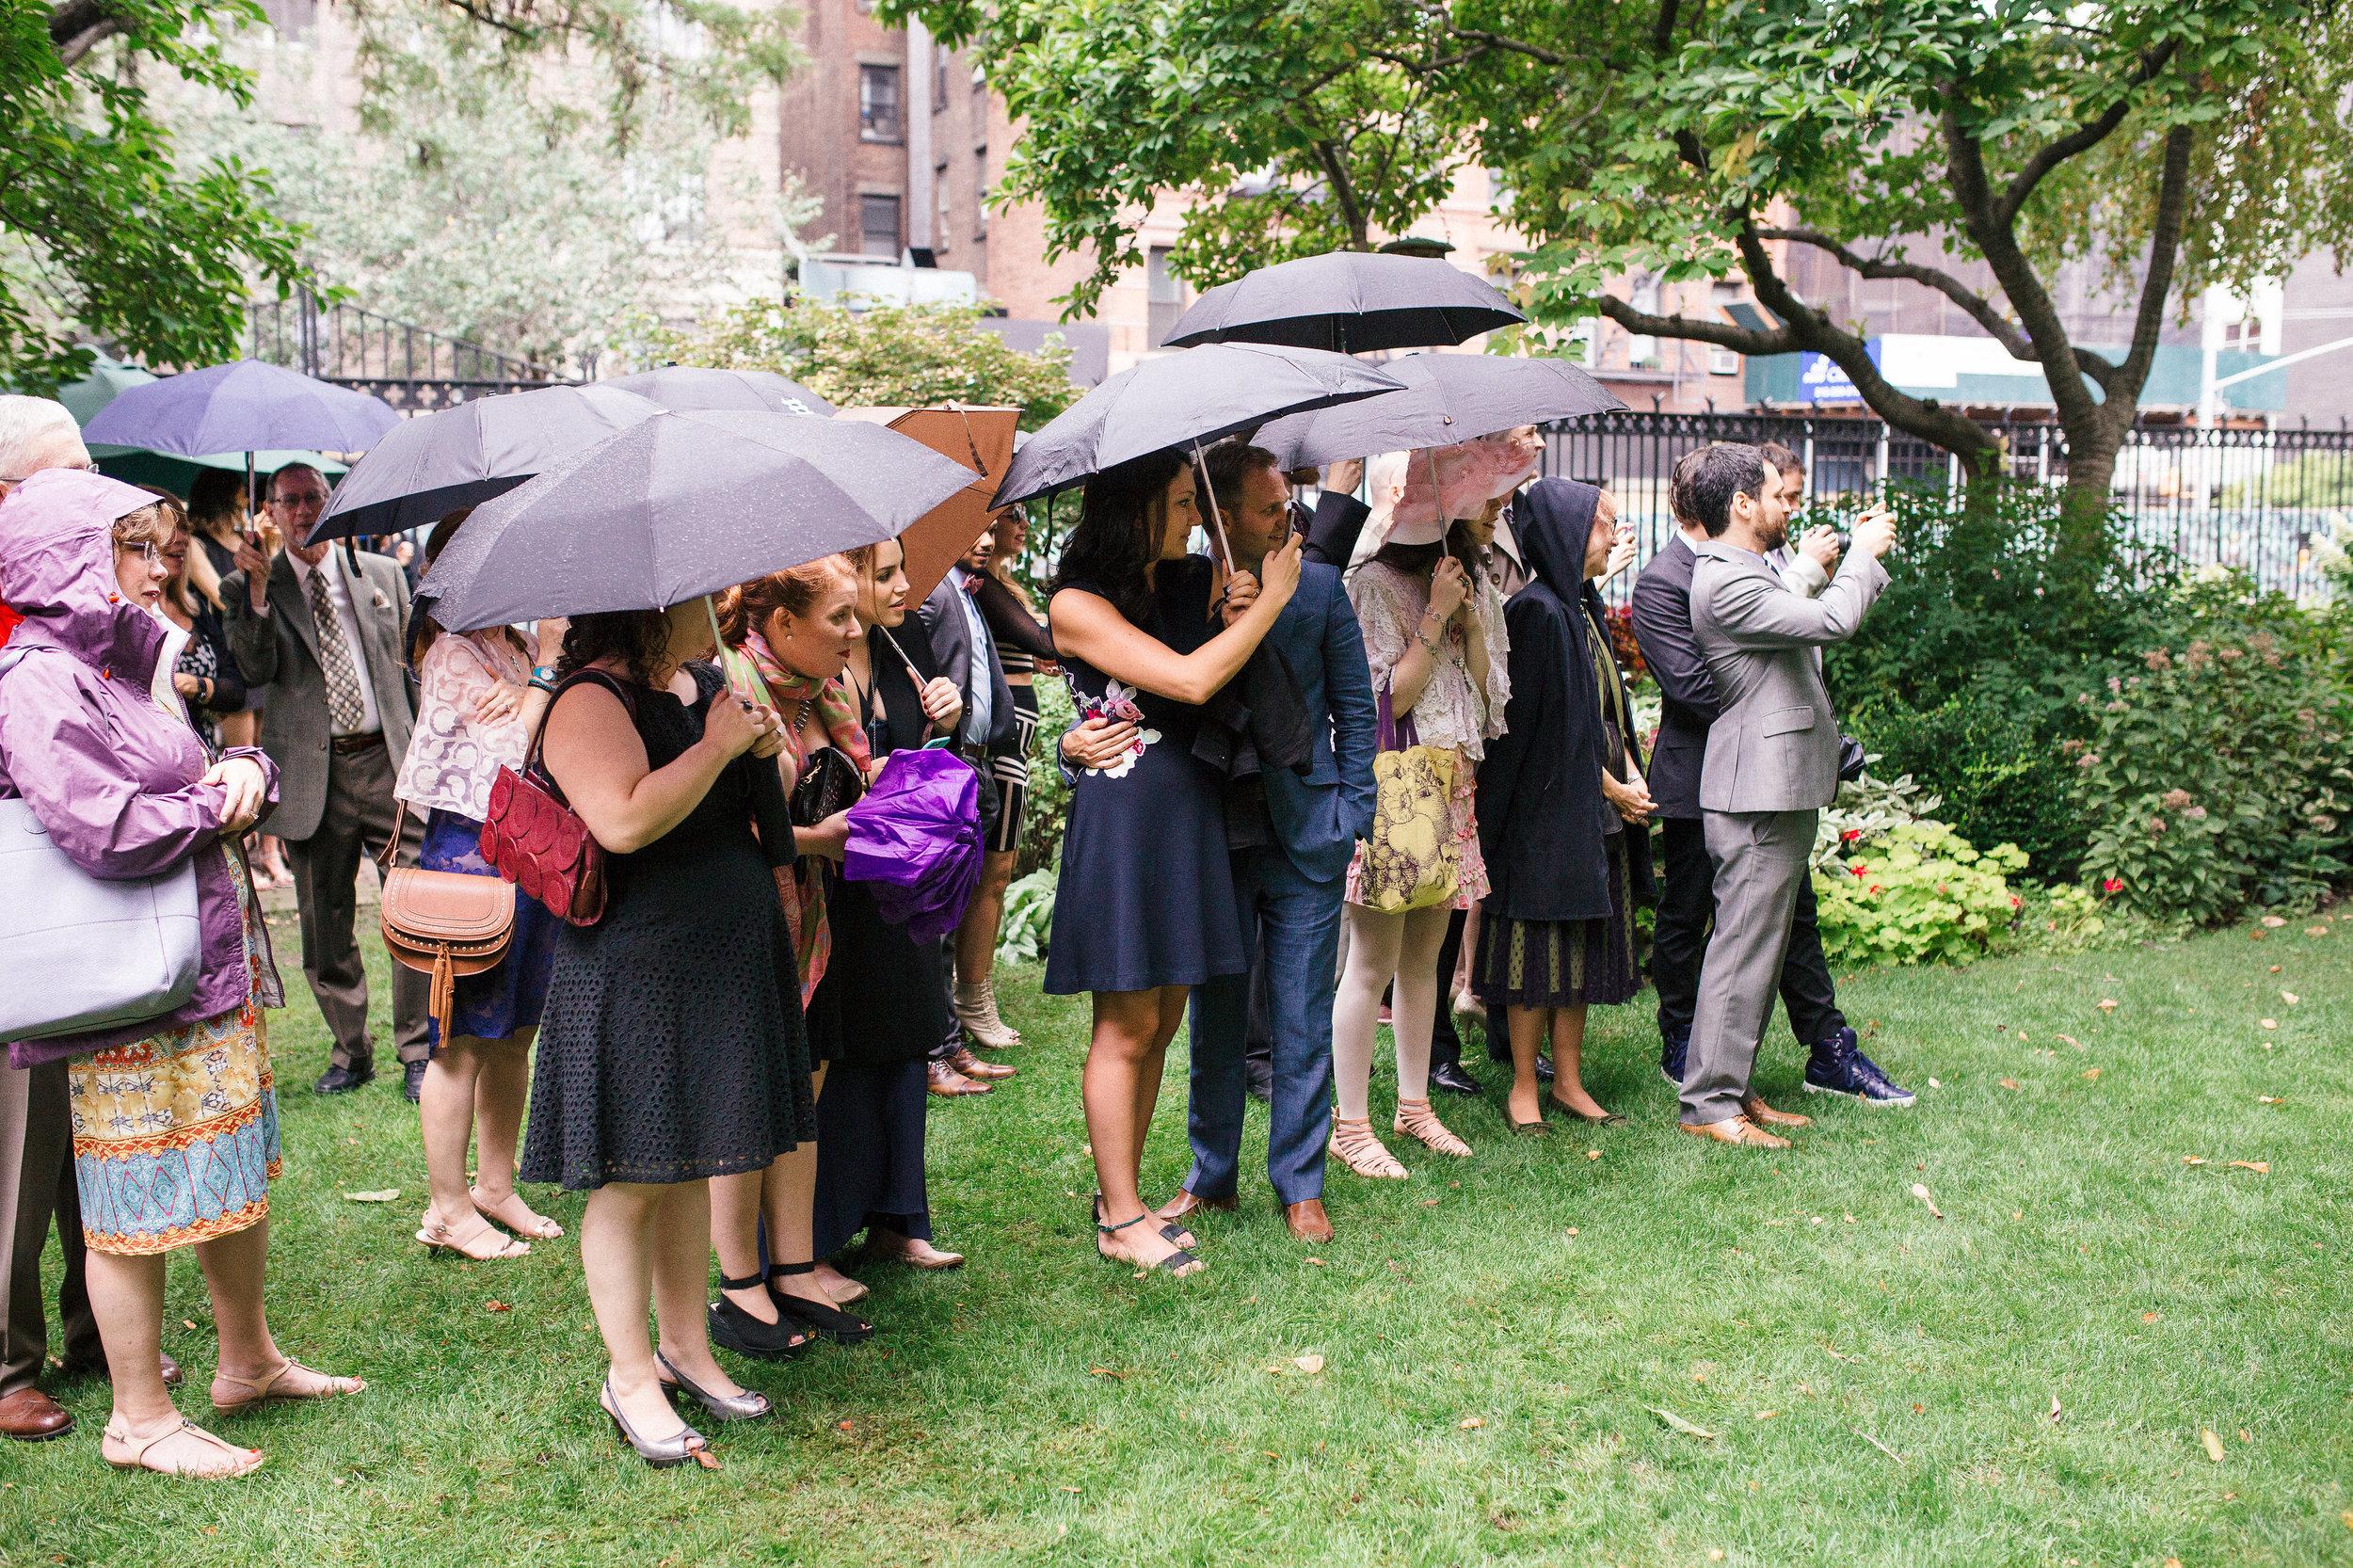 soho-nyc-new-york-wedding-photography-59.jpg